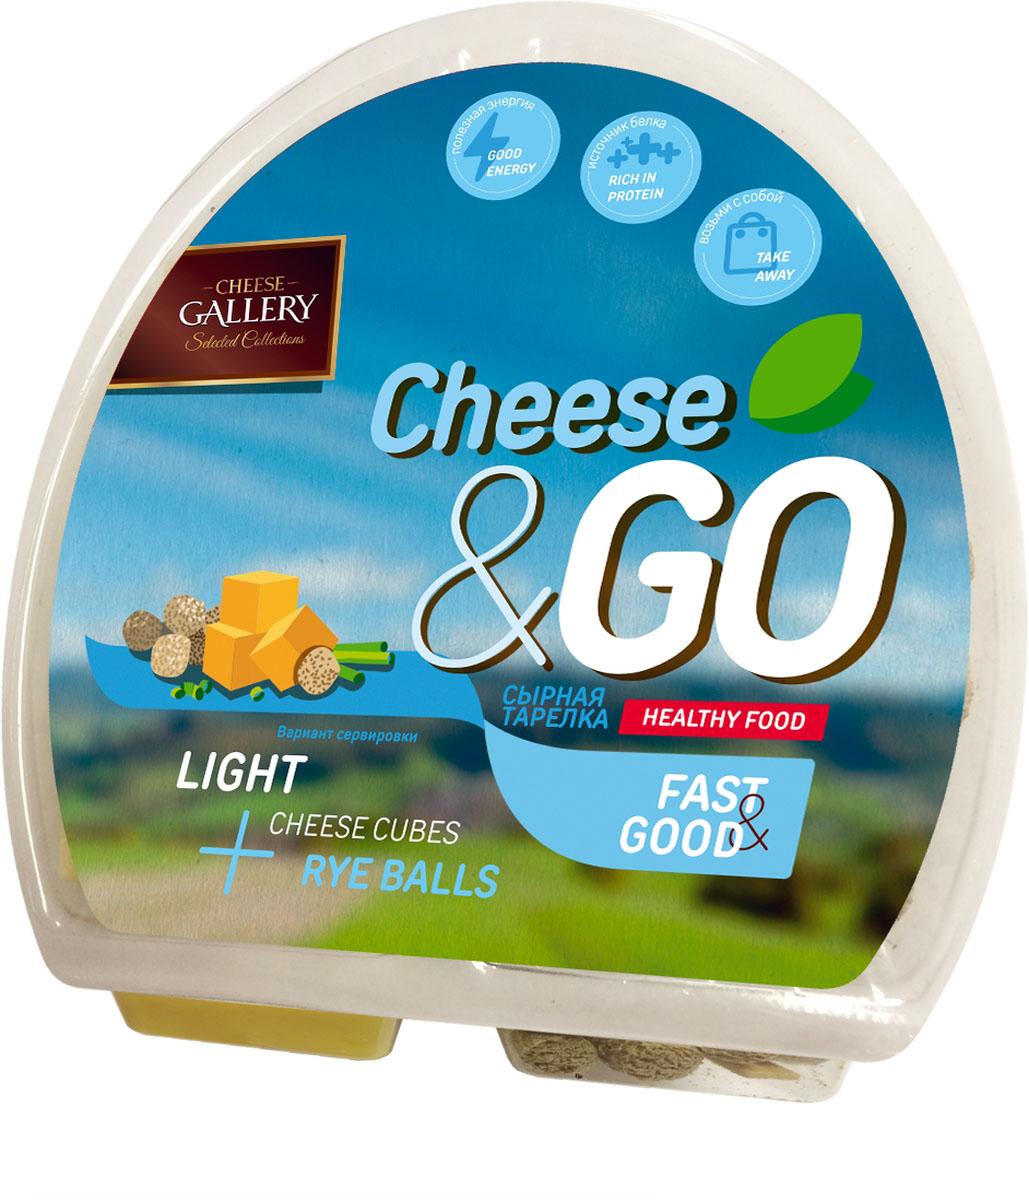 Cheese&Go Сыр Лайт, Отруби, сырная тарелка, 70 г cheese gallery